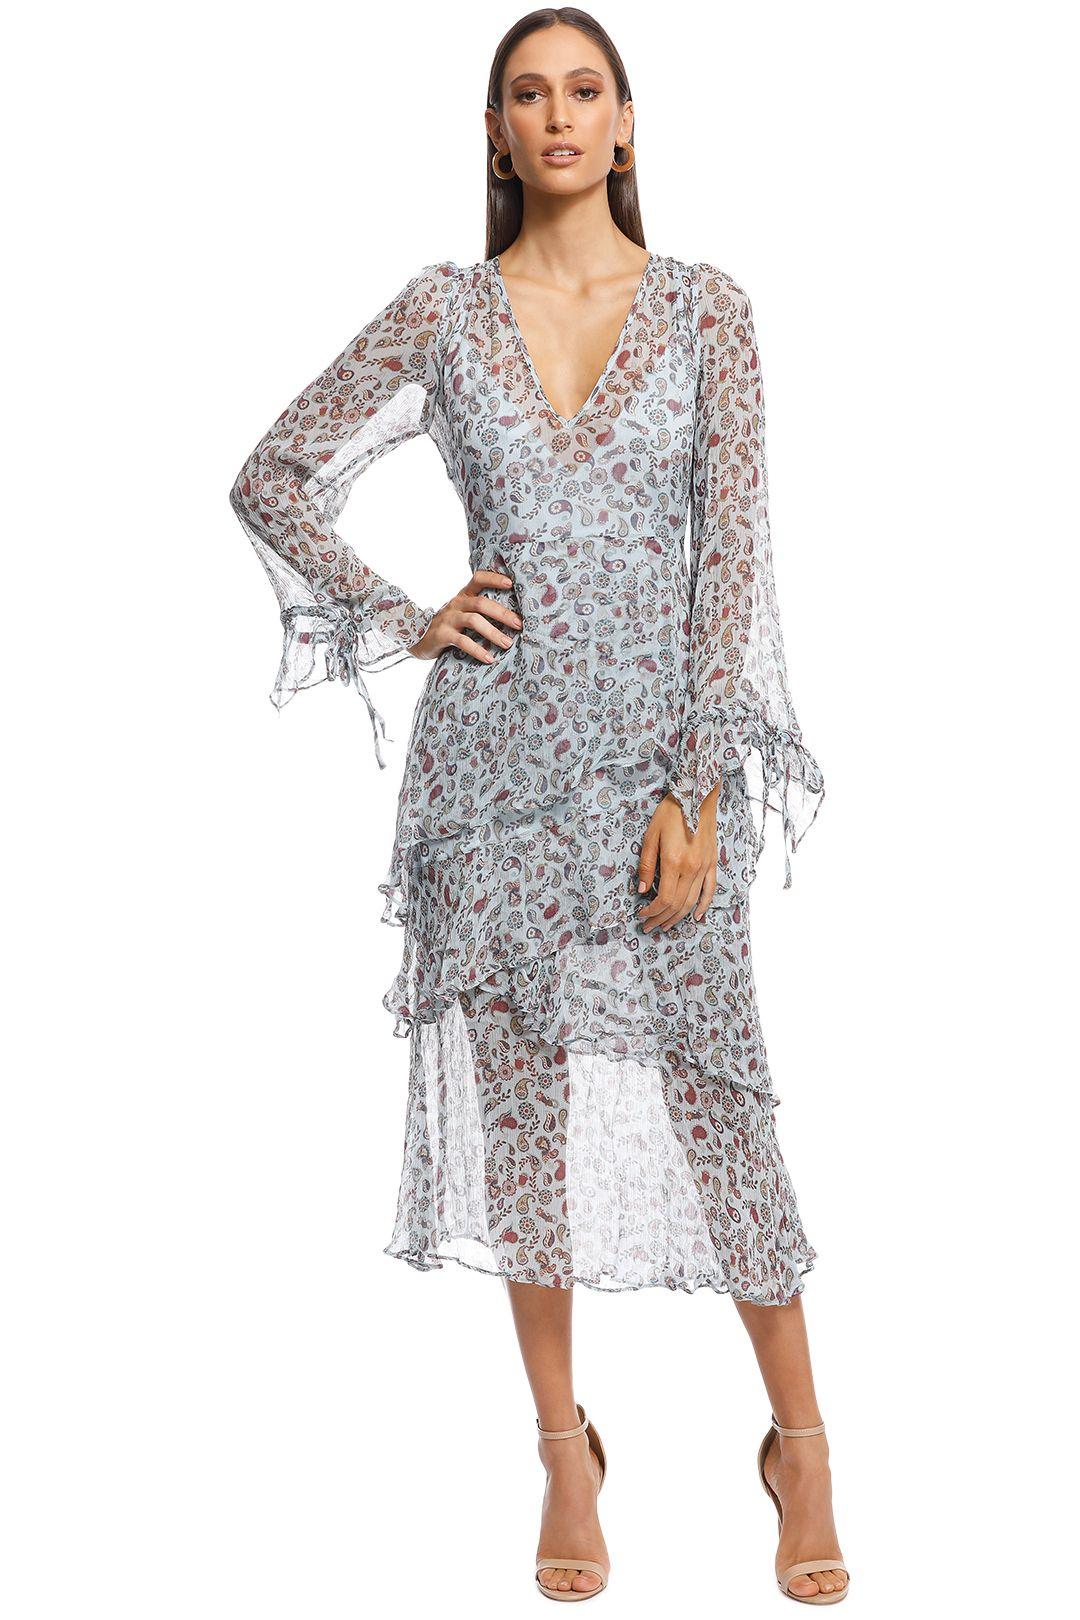 Stevie May - Delilah Midi Dress - Blue - Front